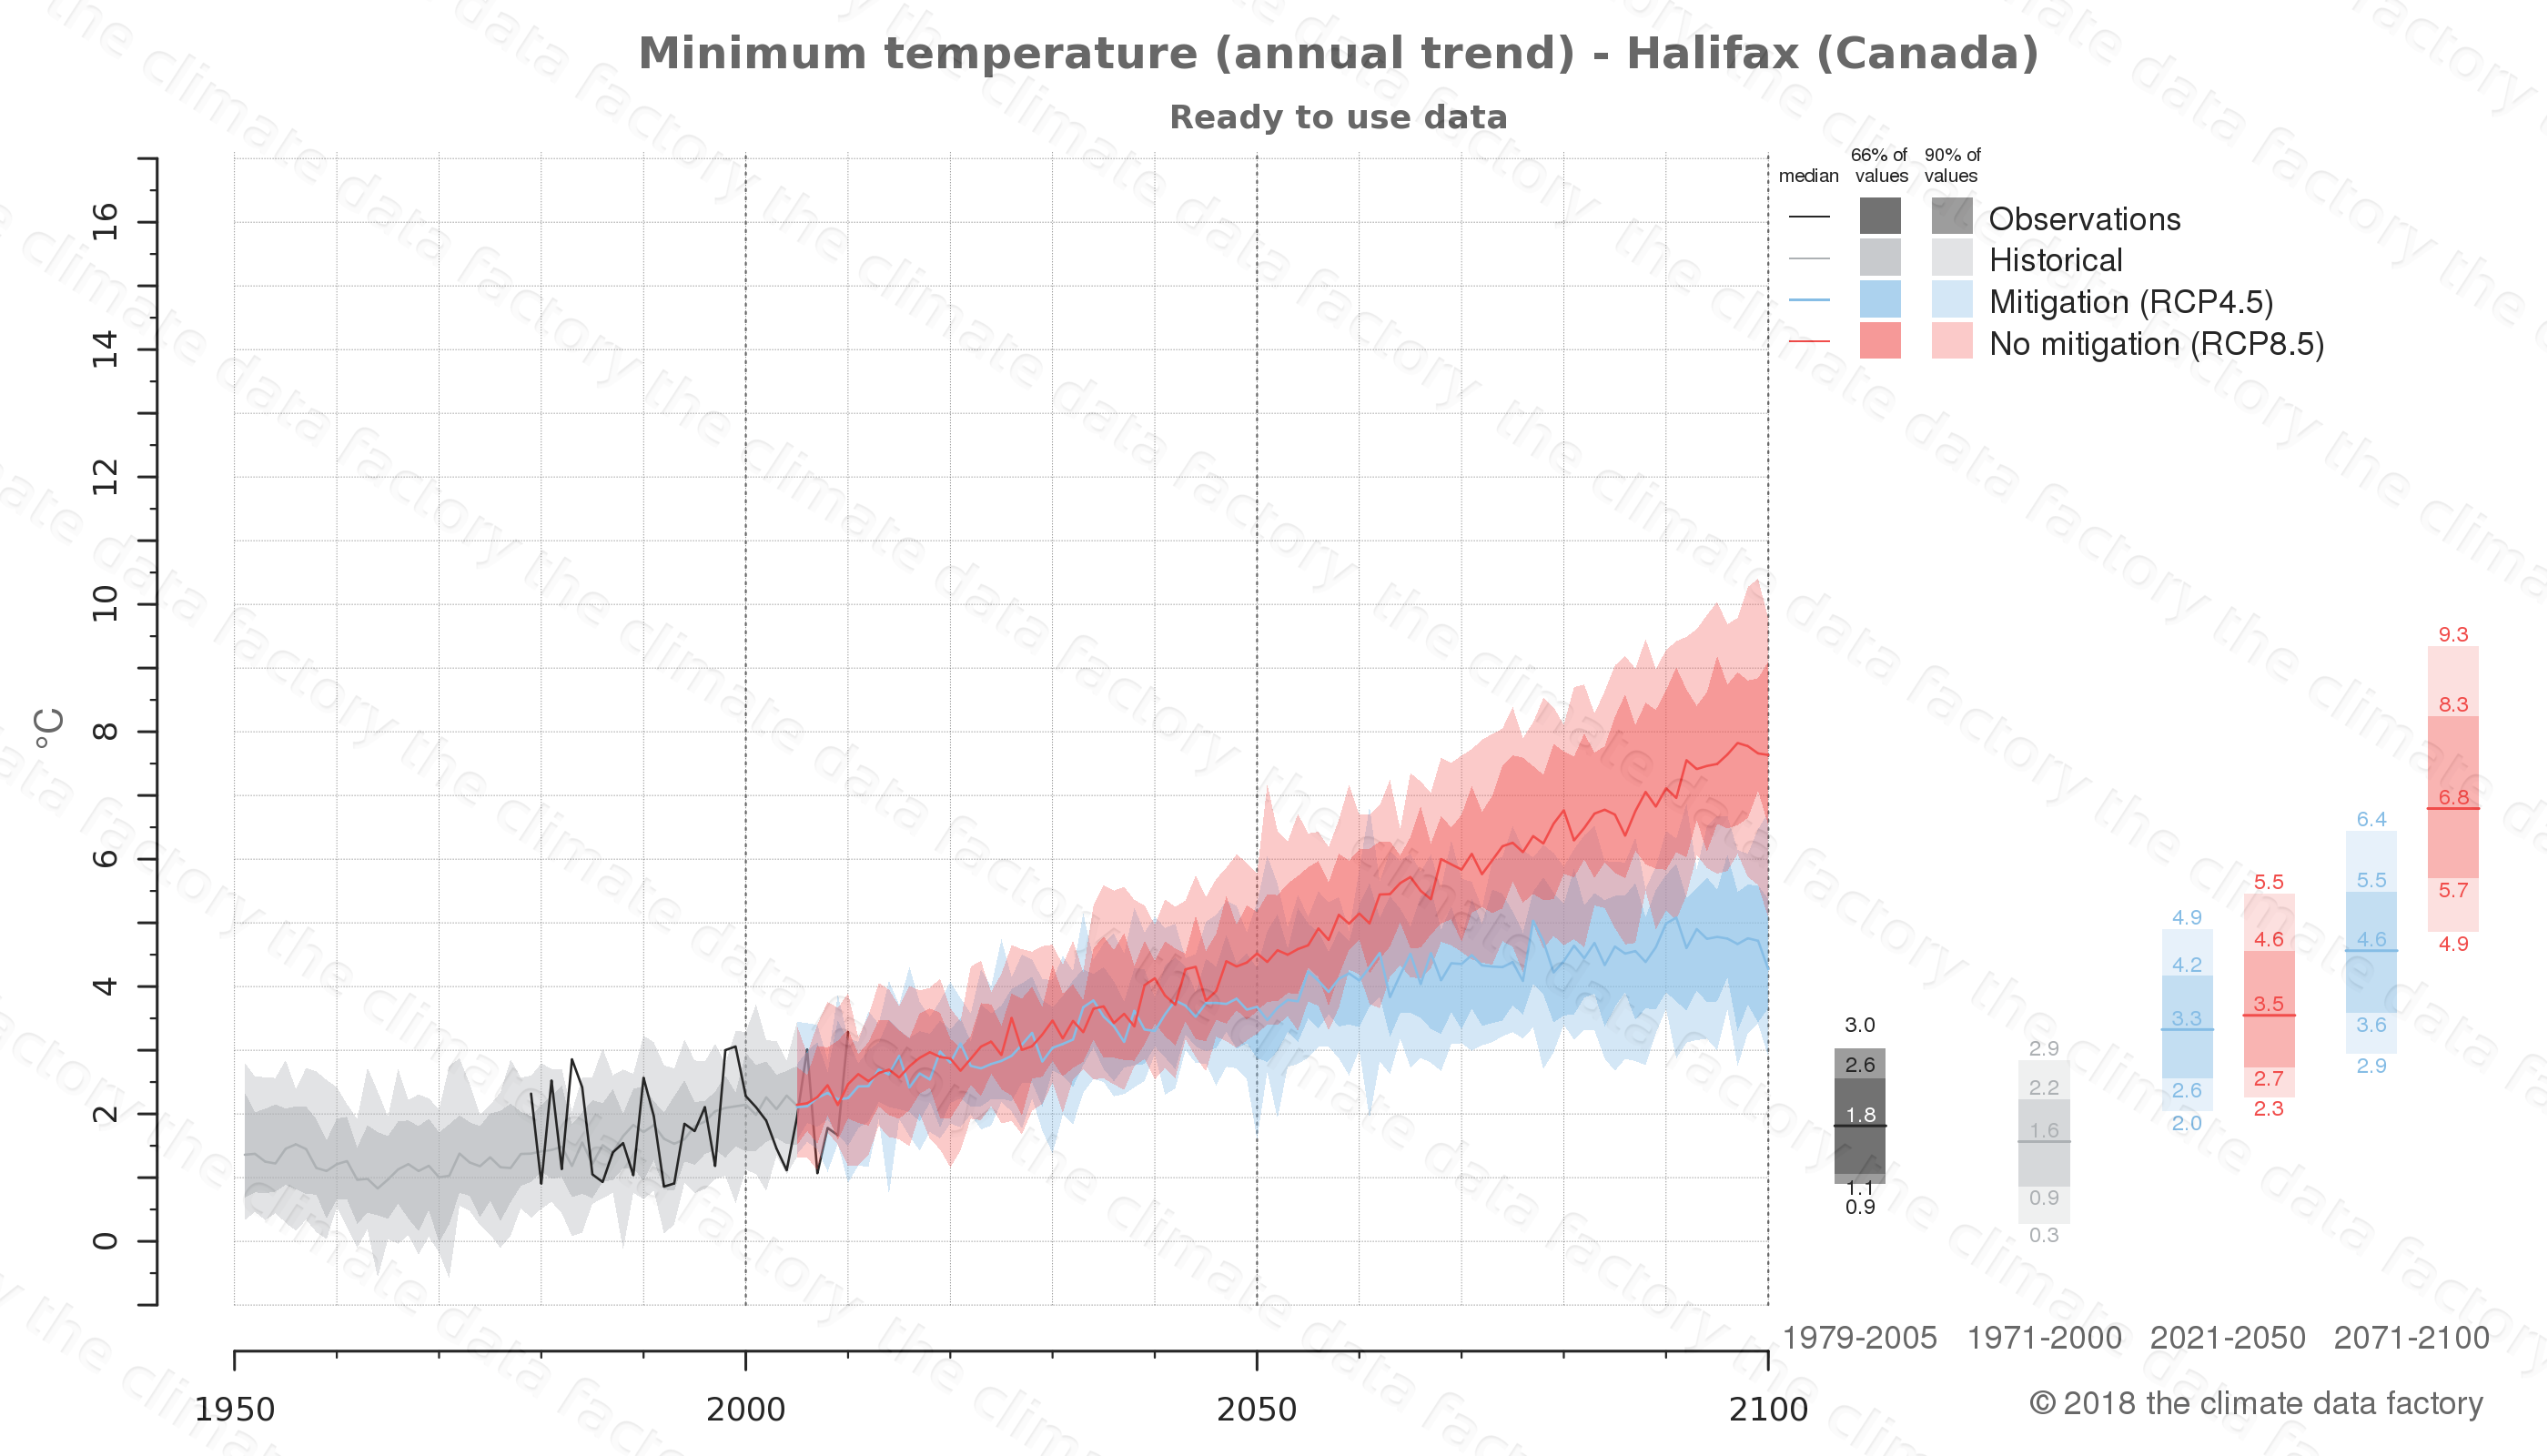 climate change data policy adaptation climate graph city data minimum-temperature halifax canada